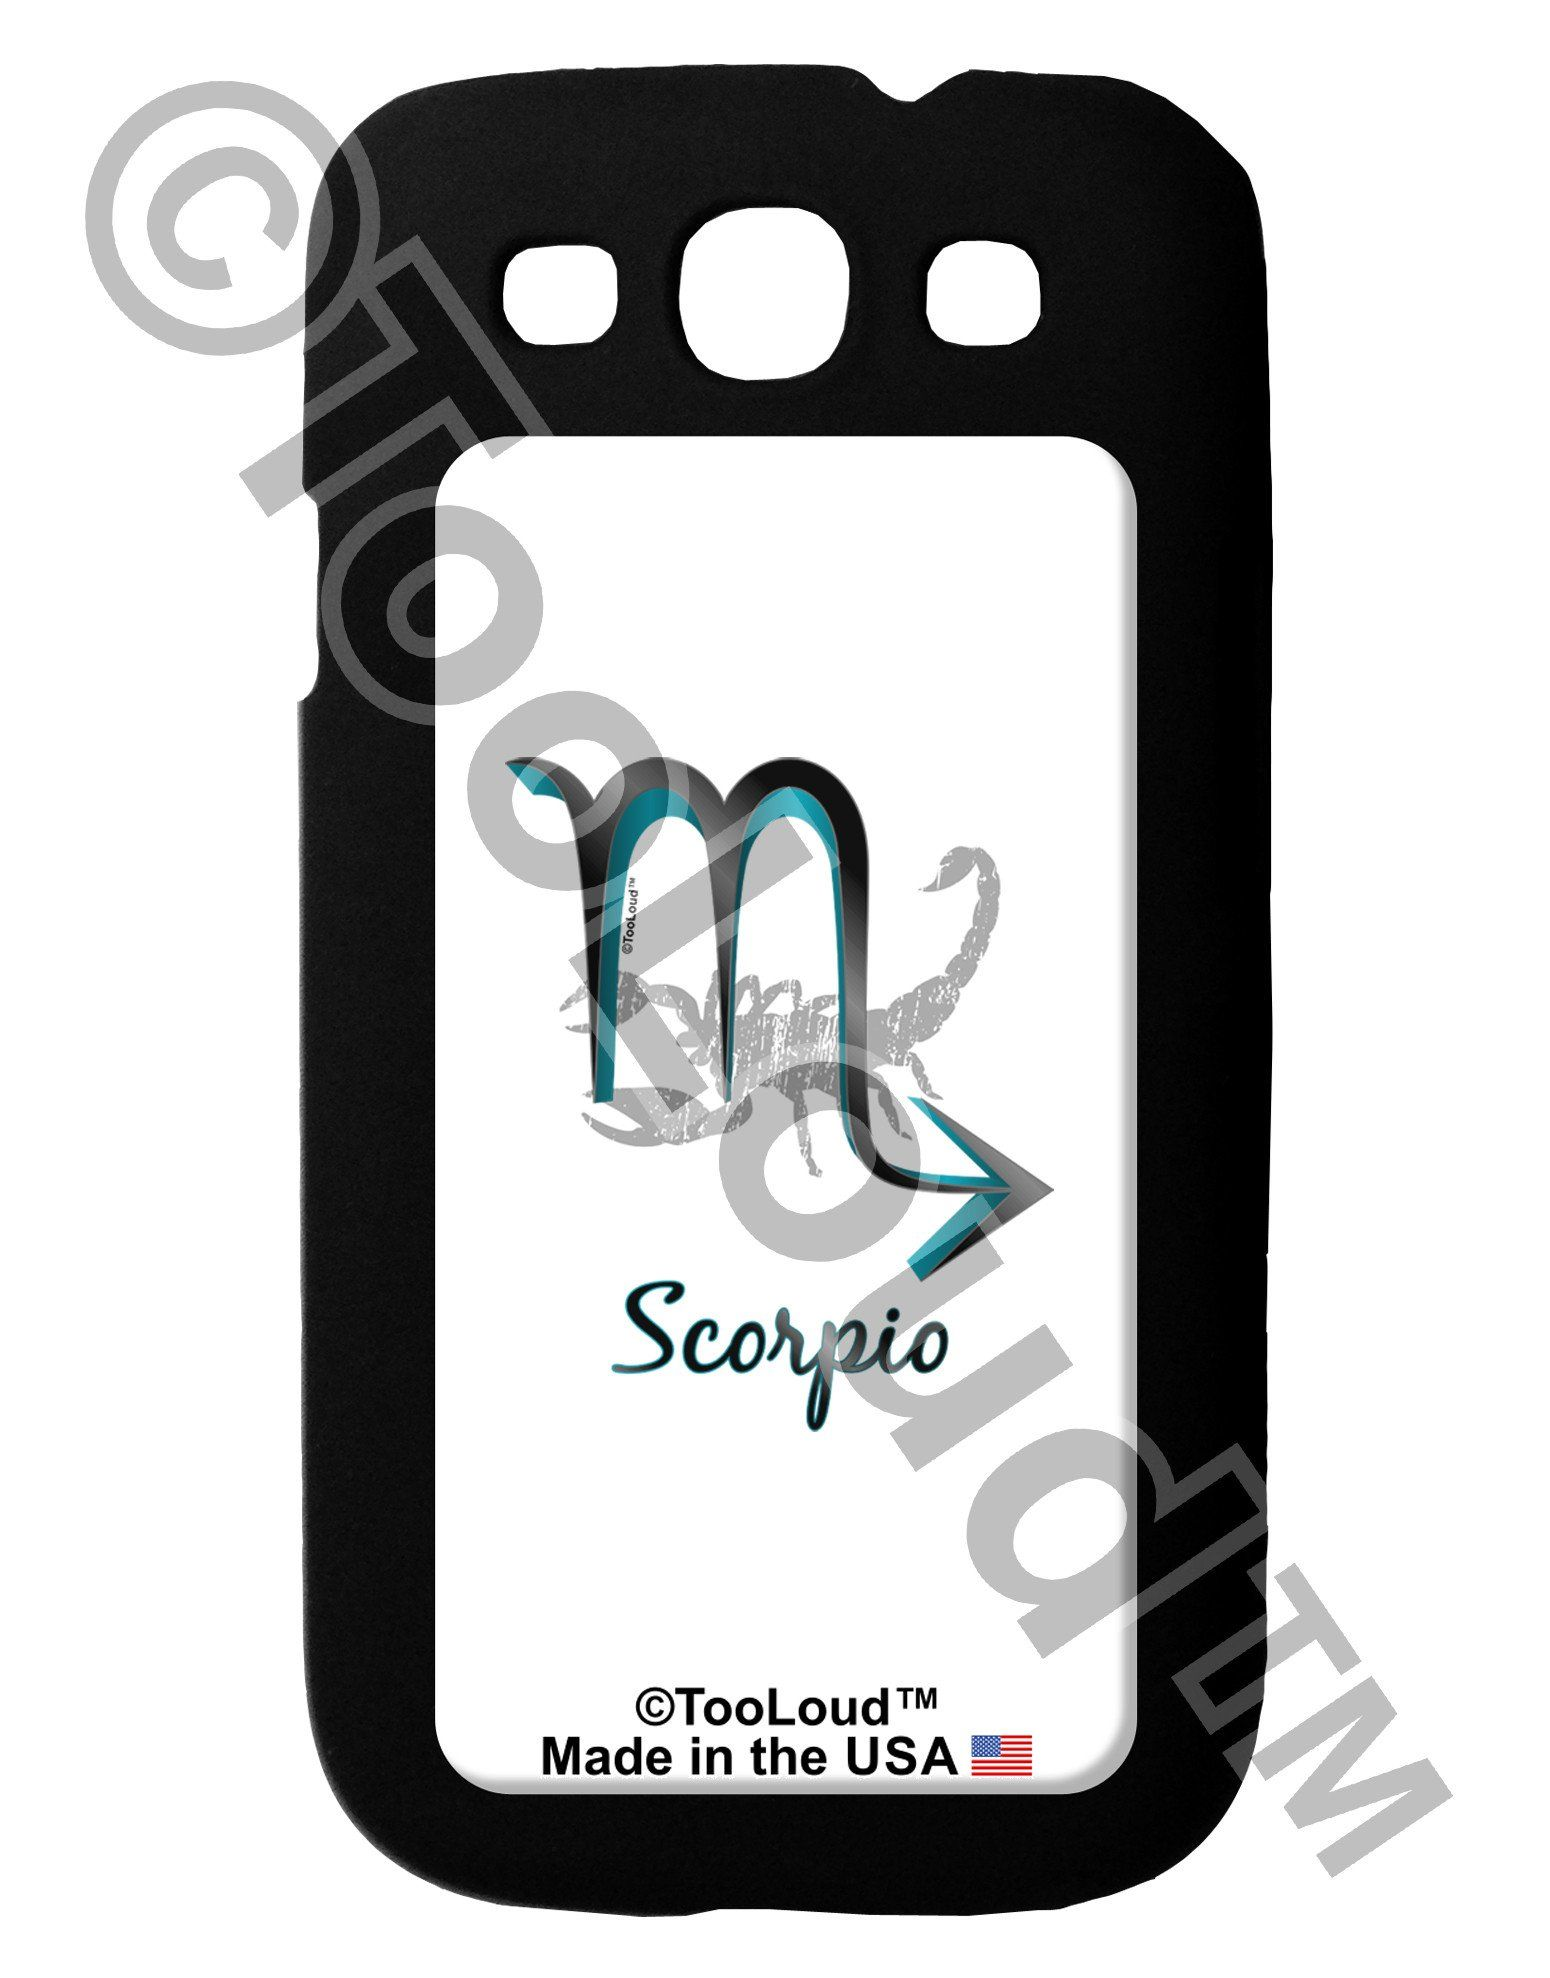 Scorpio symbol galaxy s3 case scorpio galaxy s3 cases and symbols scorpio symbol galaxy s3 case biocorpaavc